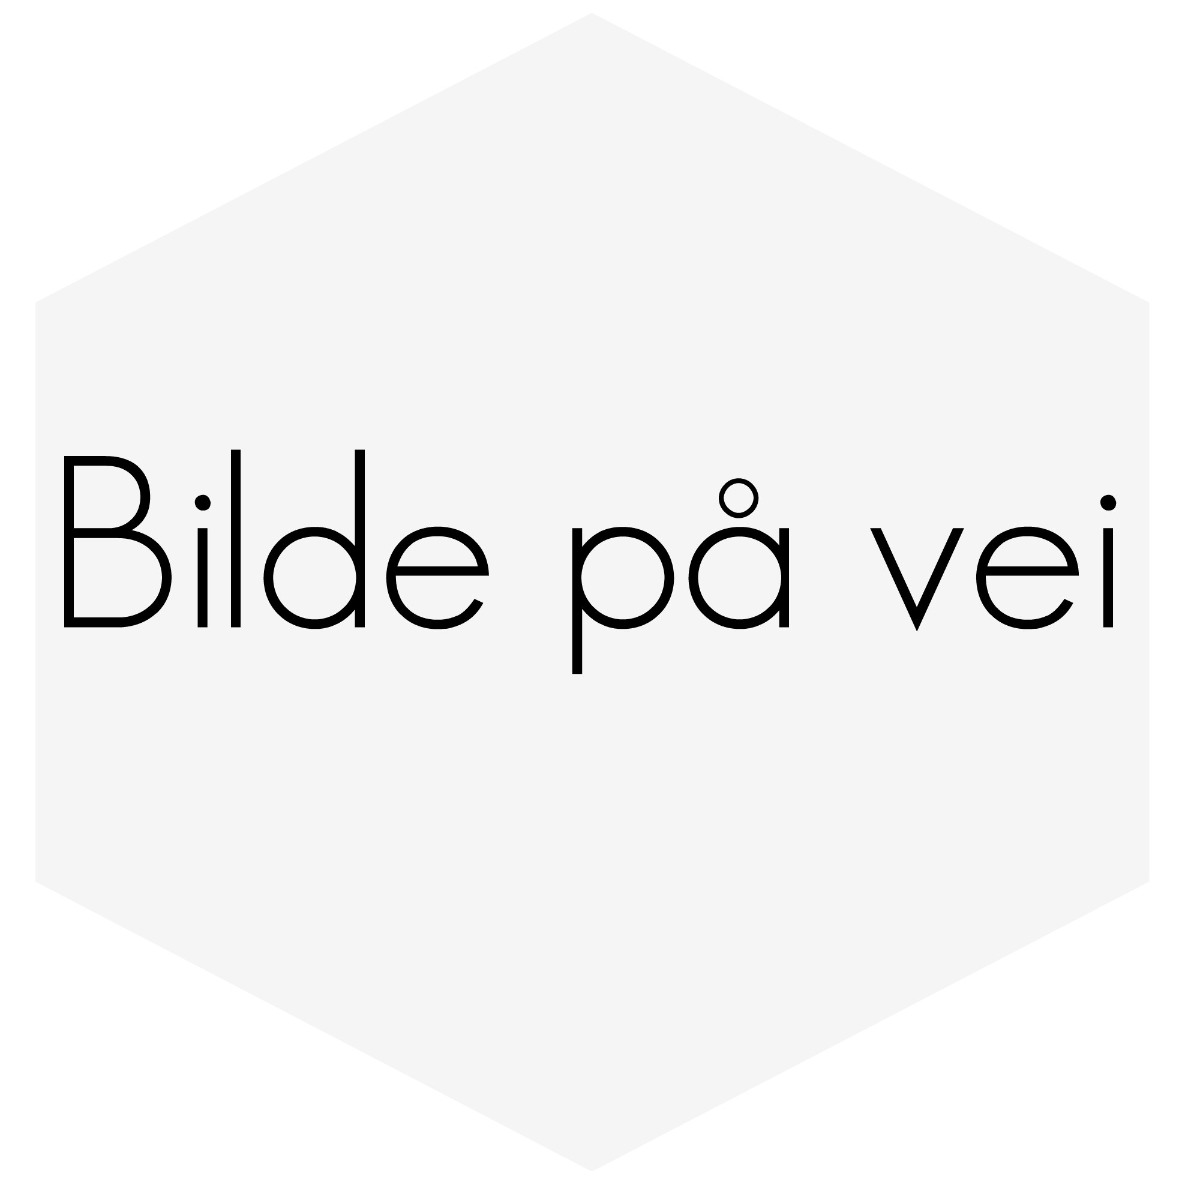 DUMP VENTIL /BLOWOFF VALVE 50mm  NUKE PERFORMANCE BLÅ